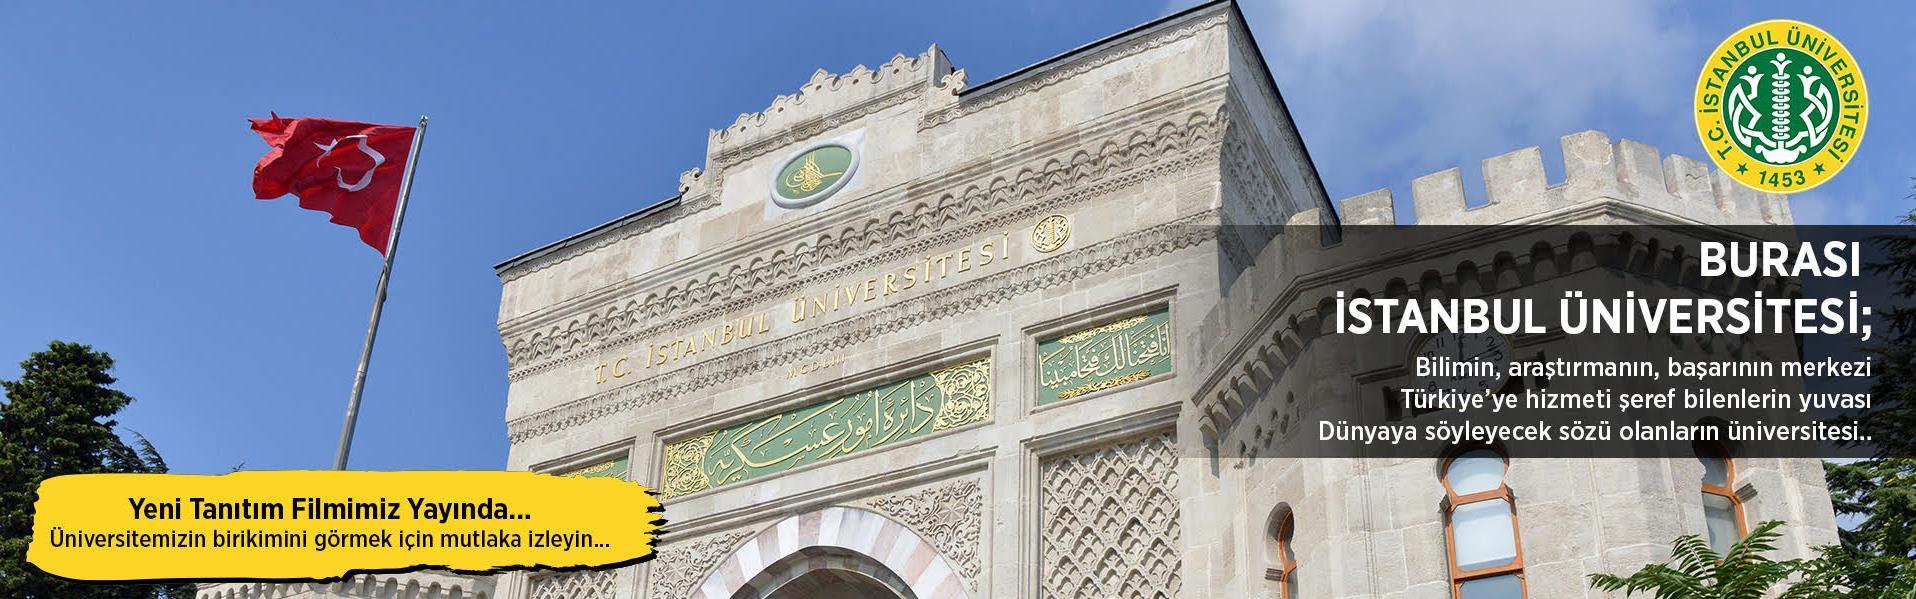 istanbul dünya üniversite